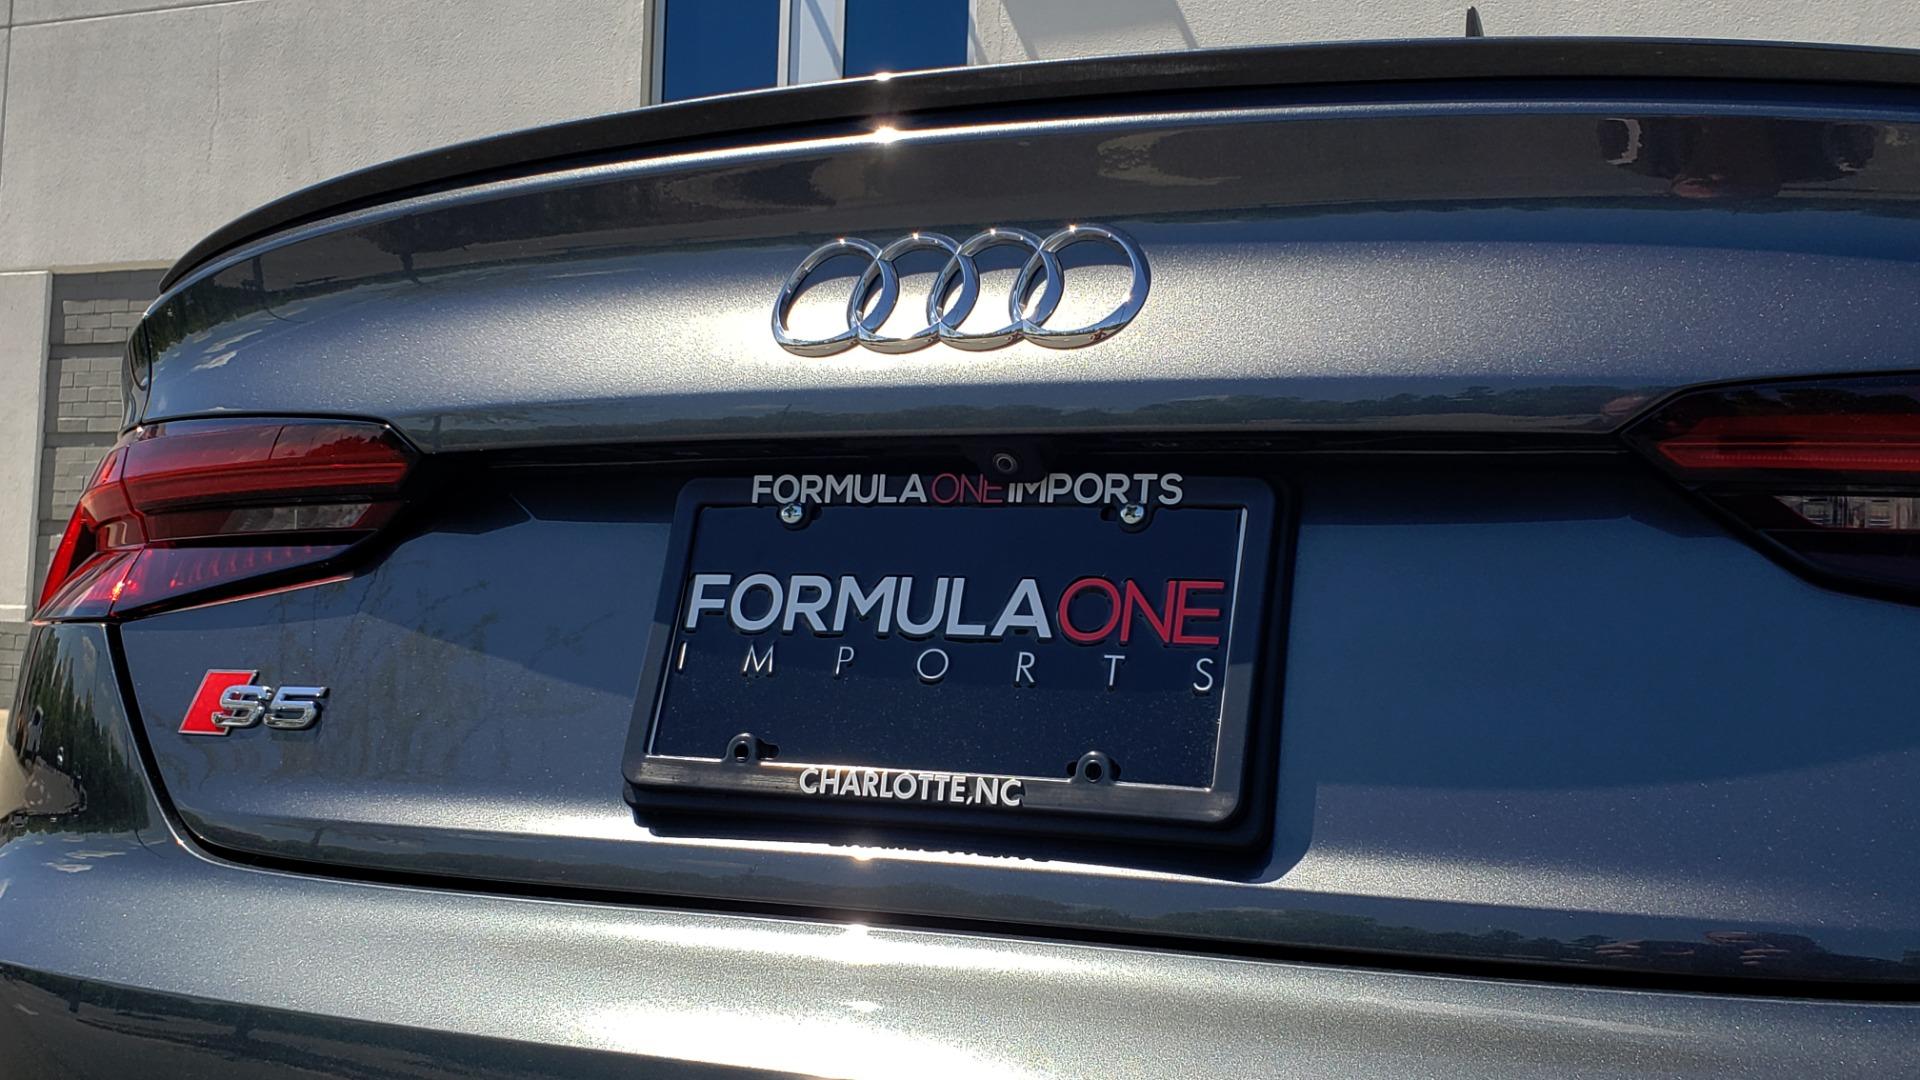 Used 2018 Audi S5 SPORTBACK PRESTIGE S-SPORT / NAV / SUNROOF / HUD / B&O SND / REARVIEW for sale $48,995 at Formula Imports in Charlotte NC 28227 30